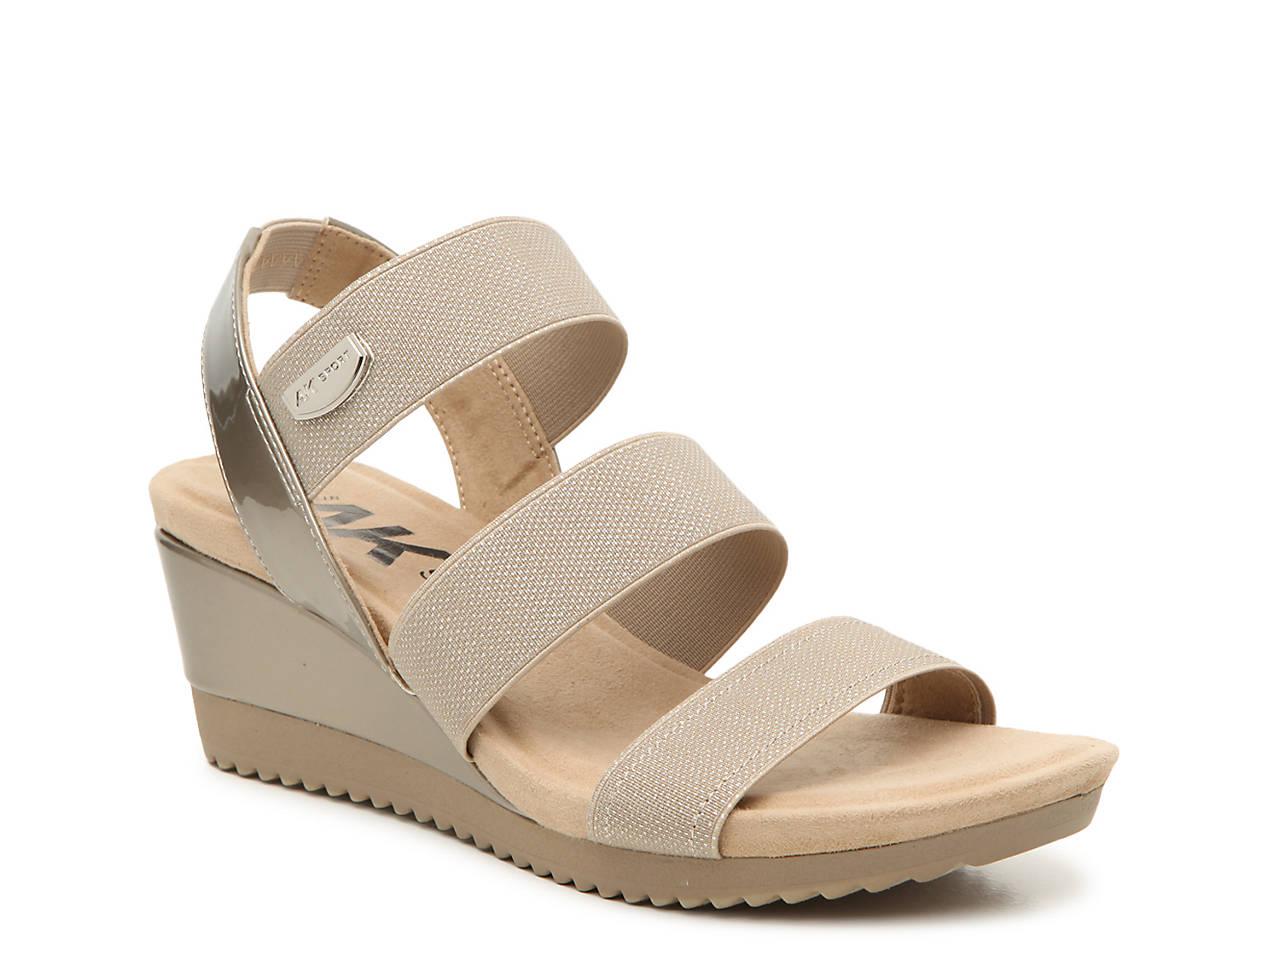 45857f3e720e3 Anne Klein Shelly Wedge Sandal Women's Shoes | DSW